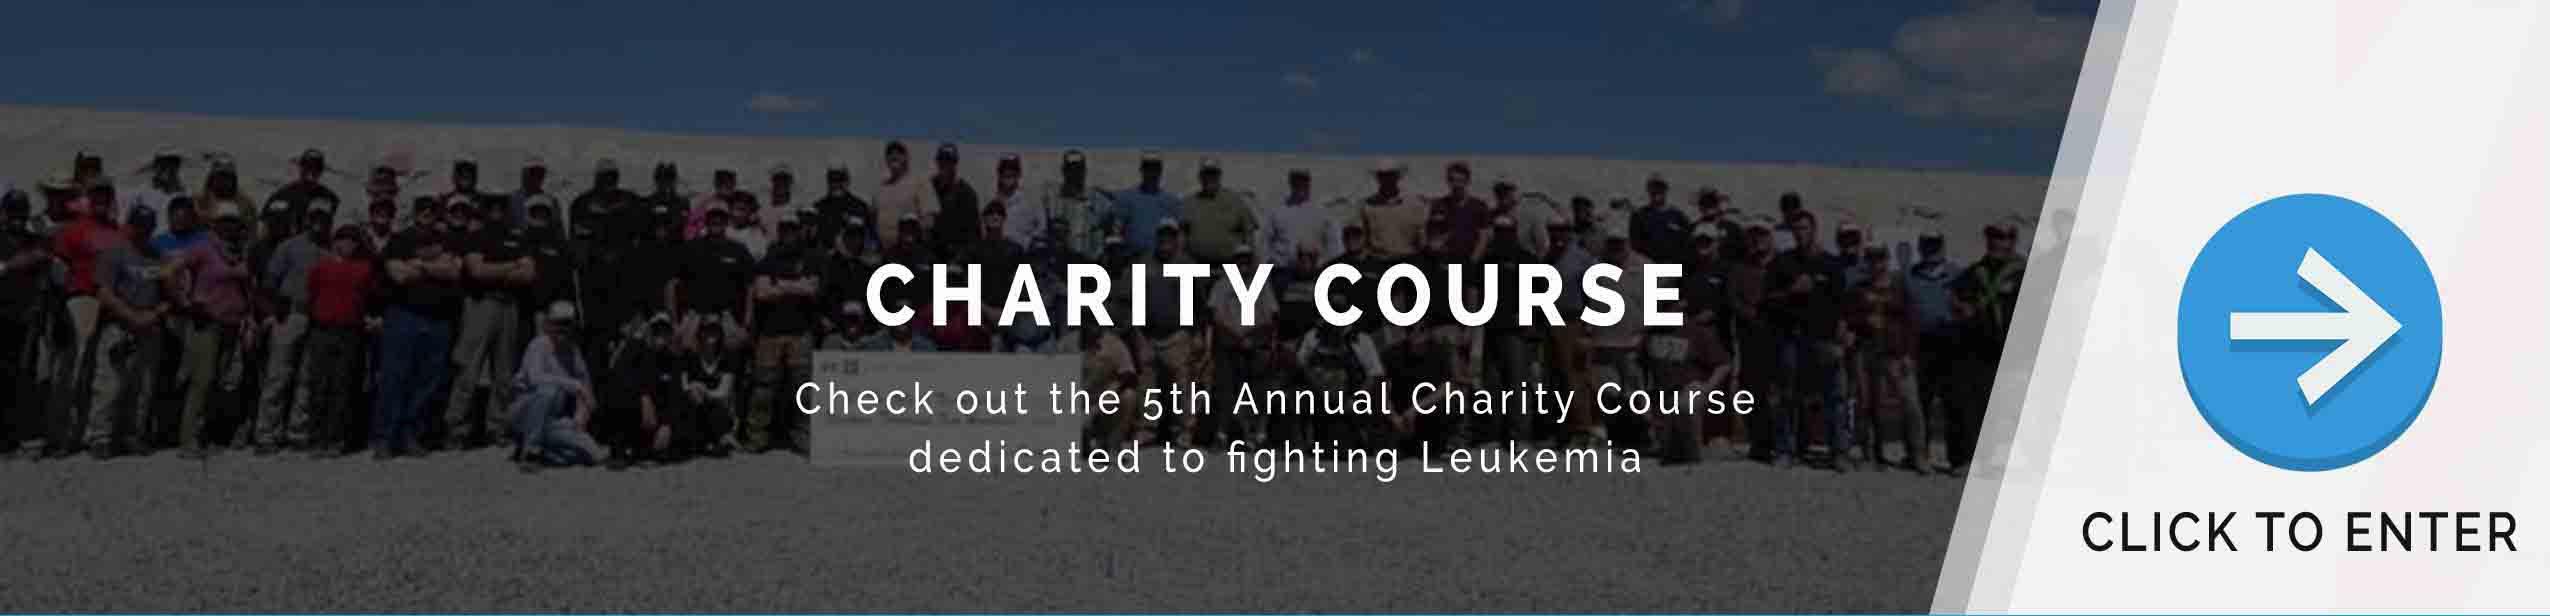 SDCGO Charity